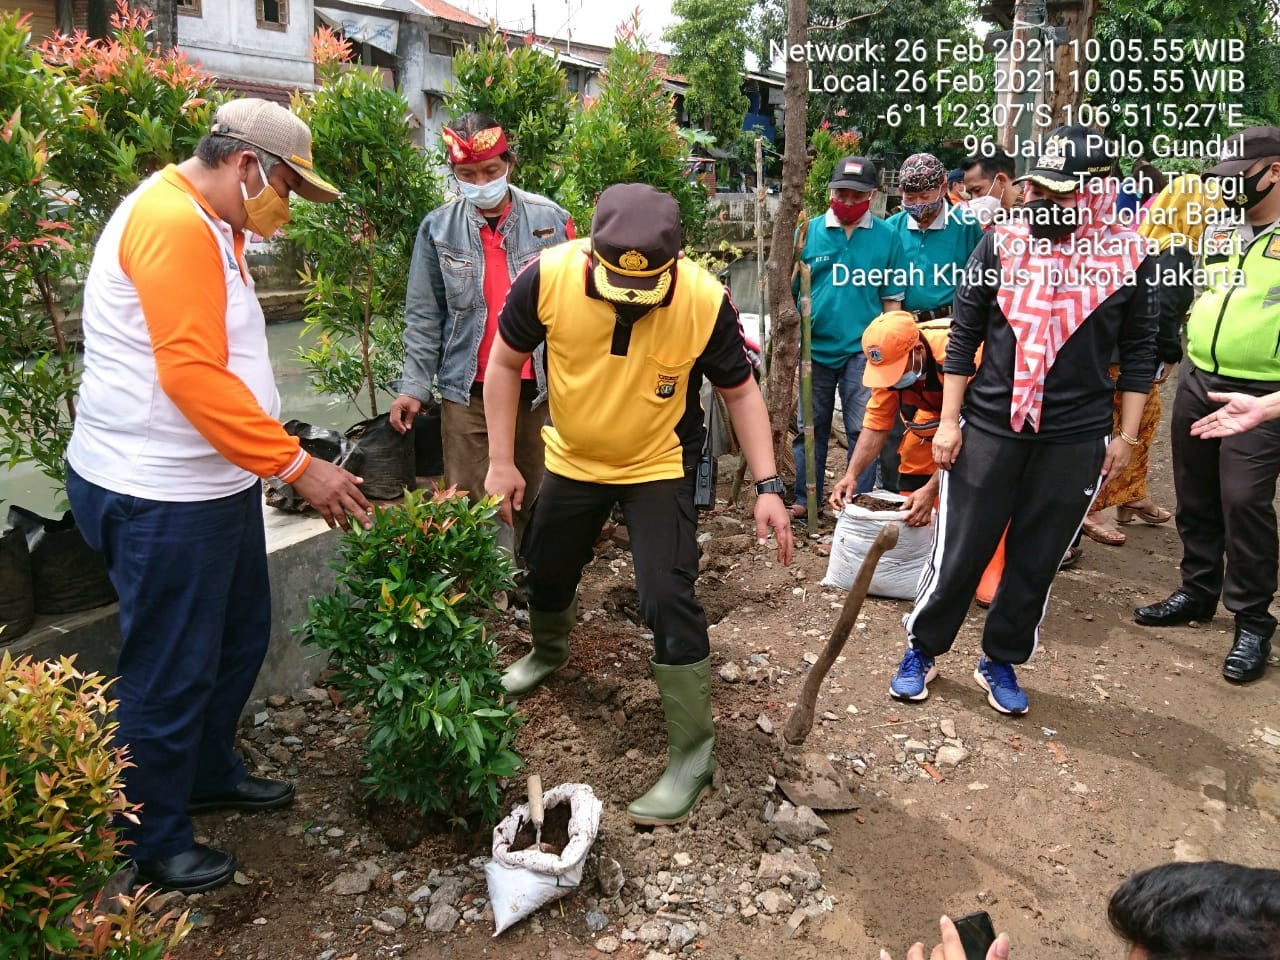 Polsek Johar Baru Bersama 3 Pilar Gerakan Tanam Pohon di Kali Sentiong